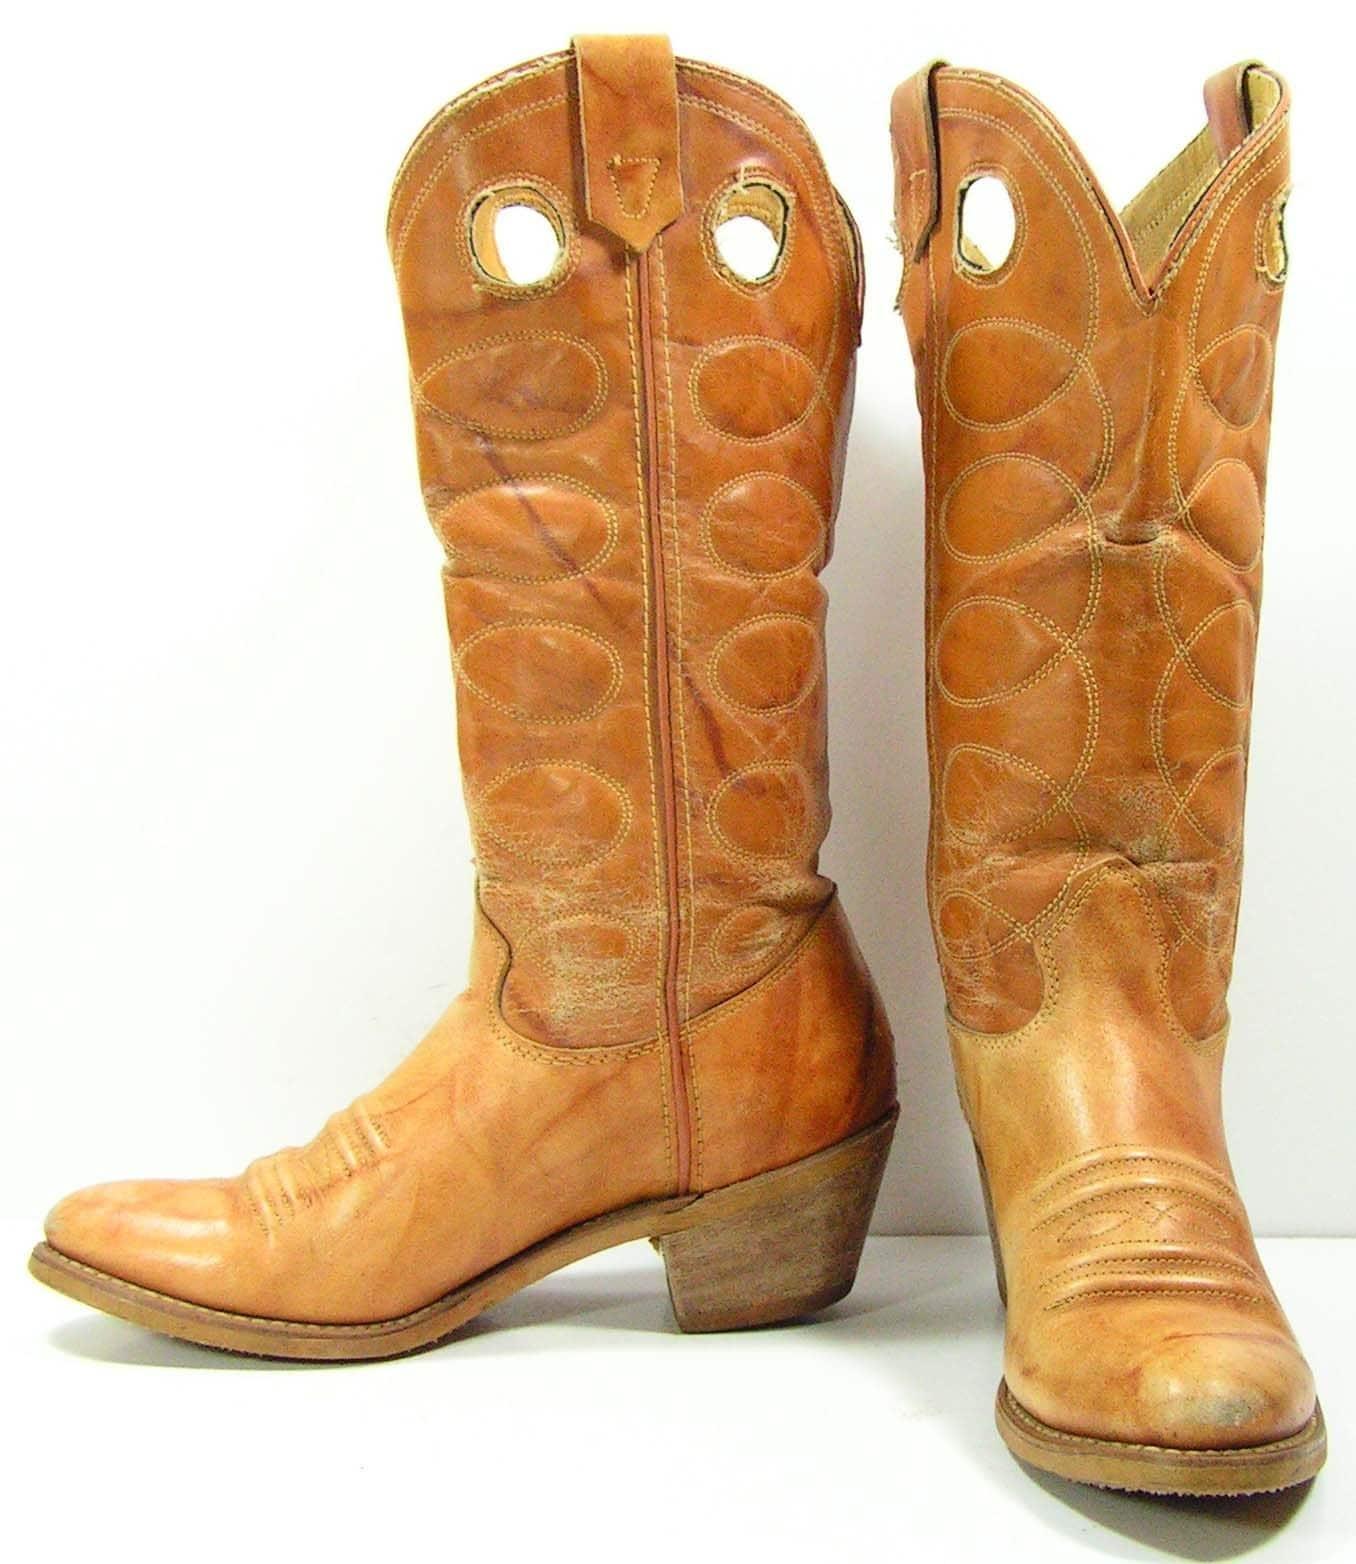 Creative Gameday Boots Womenu0026#39;s 10u0026quot; Short Black Leather Texas Au0026M Cowboy Boots Size 8 - Walmart.com